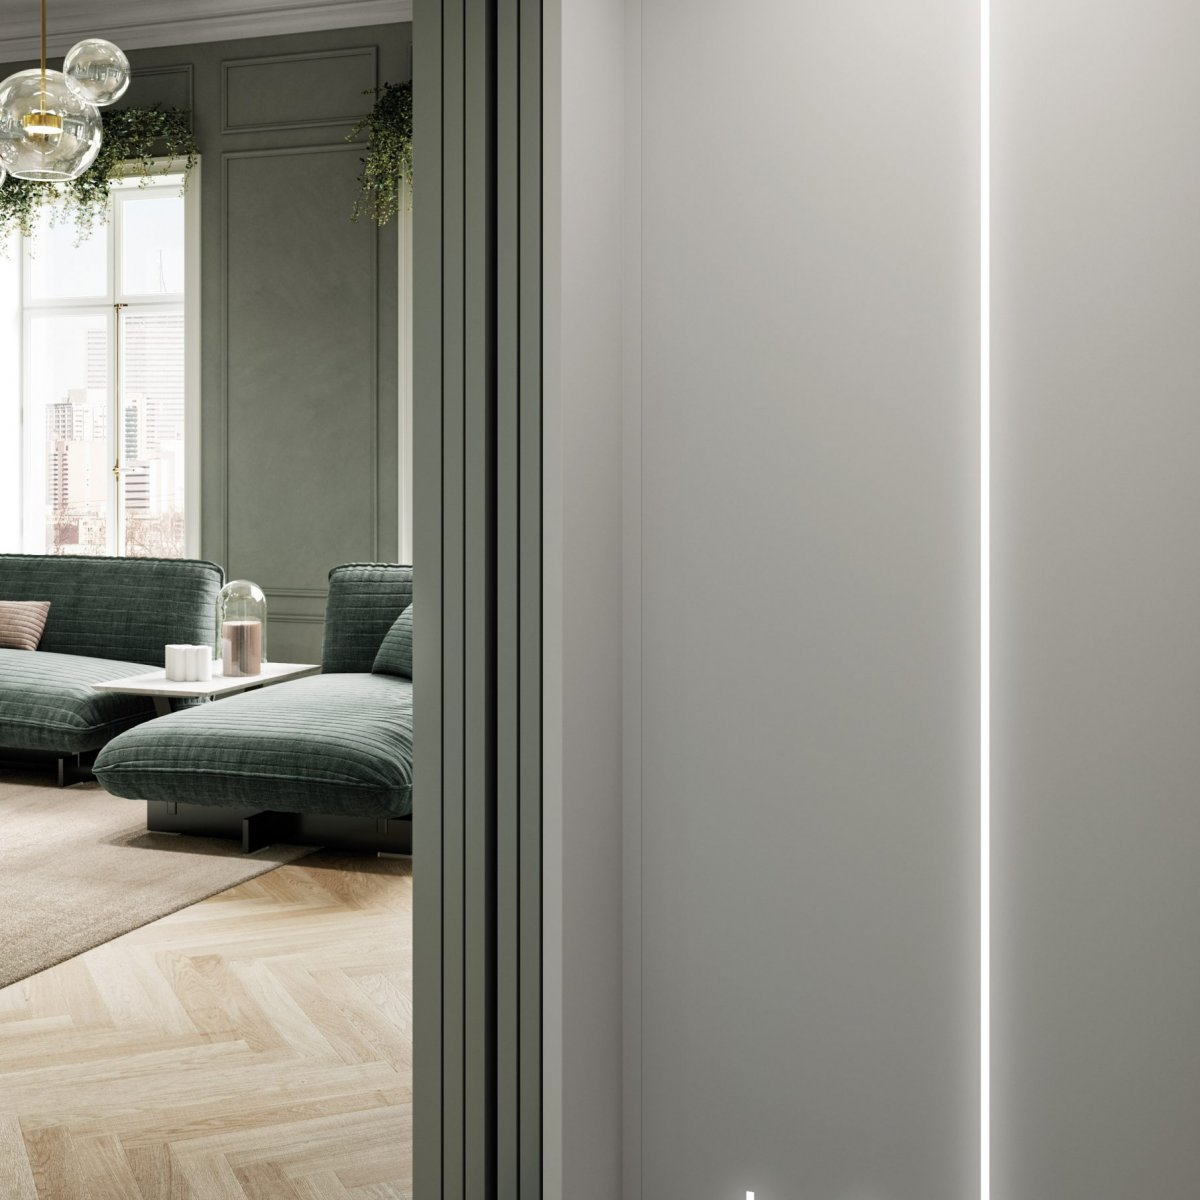 Home Lift | Simplex Elevators Gallery Image 9